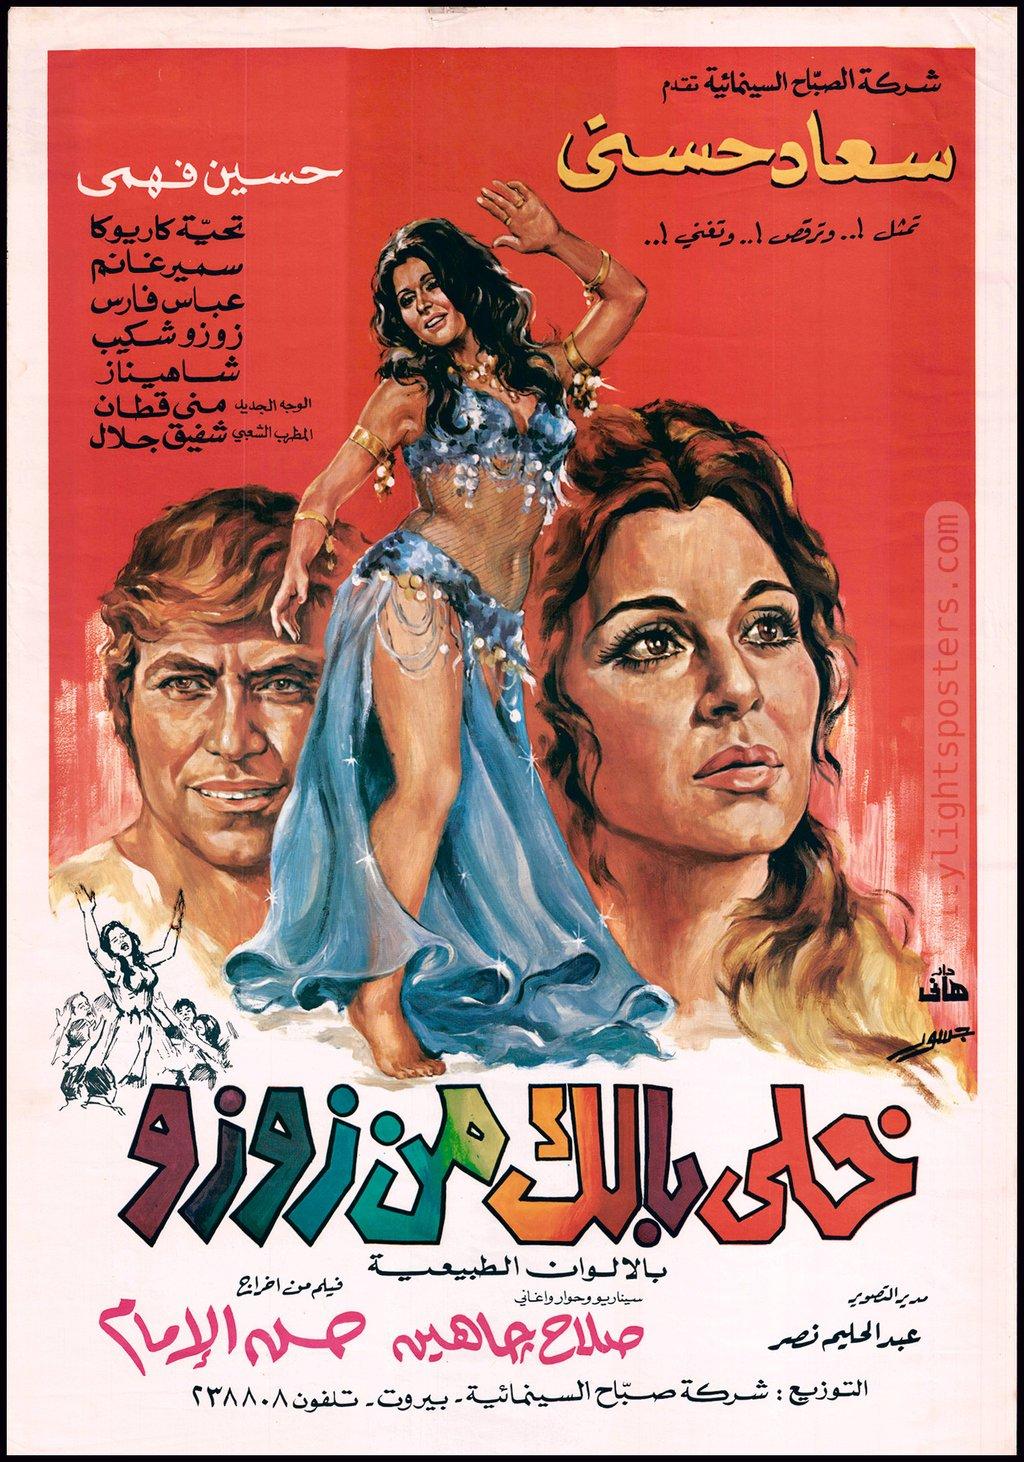 egyptian posters film zouzou poster من خلي بالك balak soad hosny khali 1972 bygone زوزو min lebanese era artwork collecting